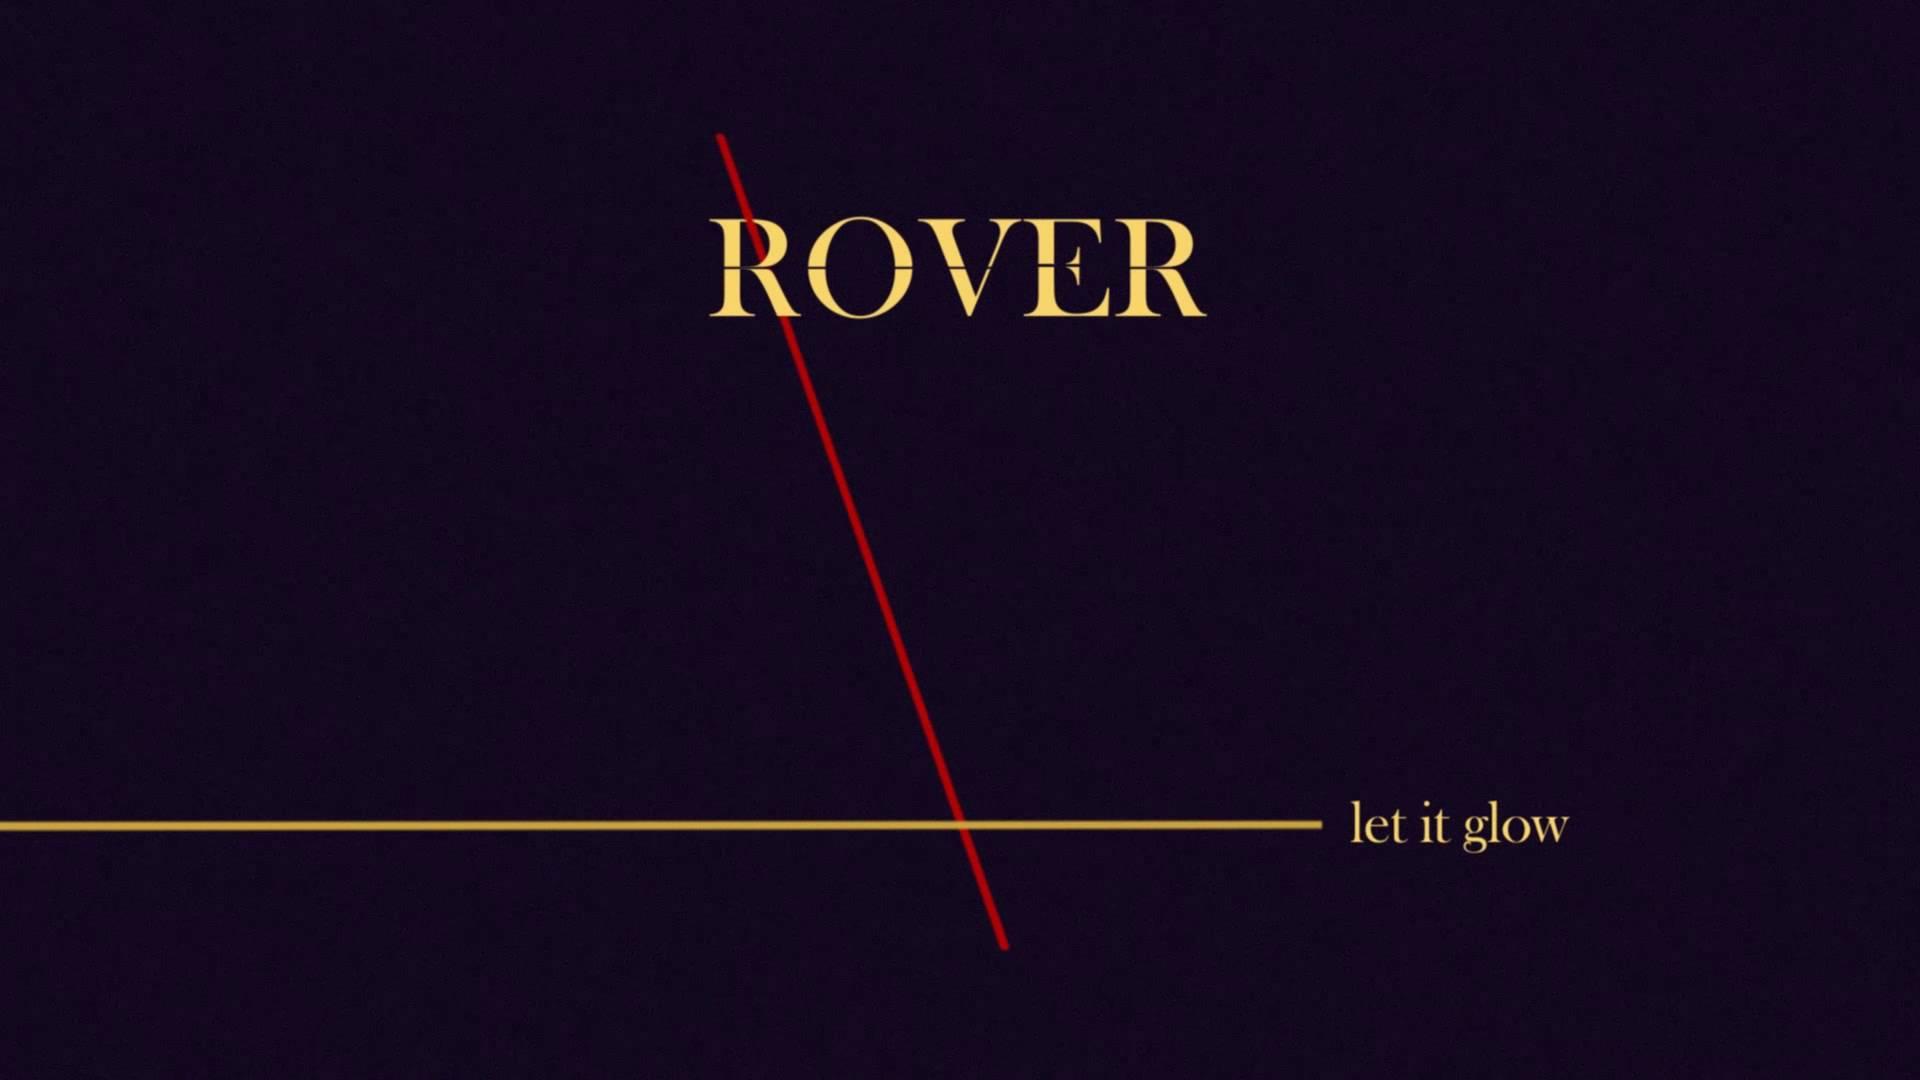 rover3.jpg